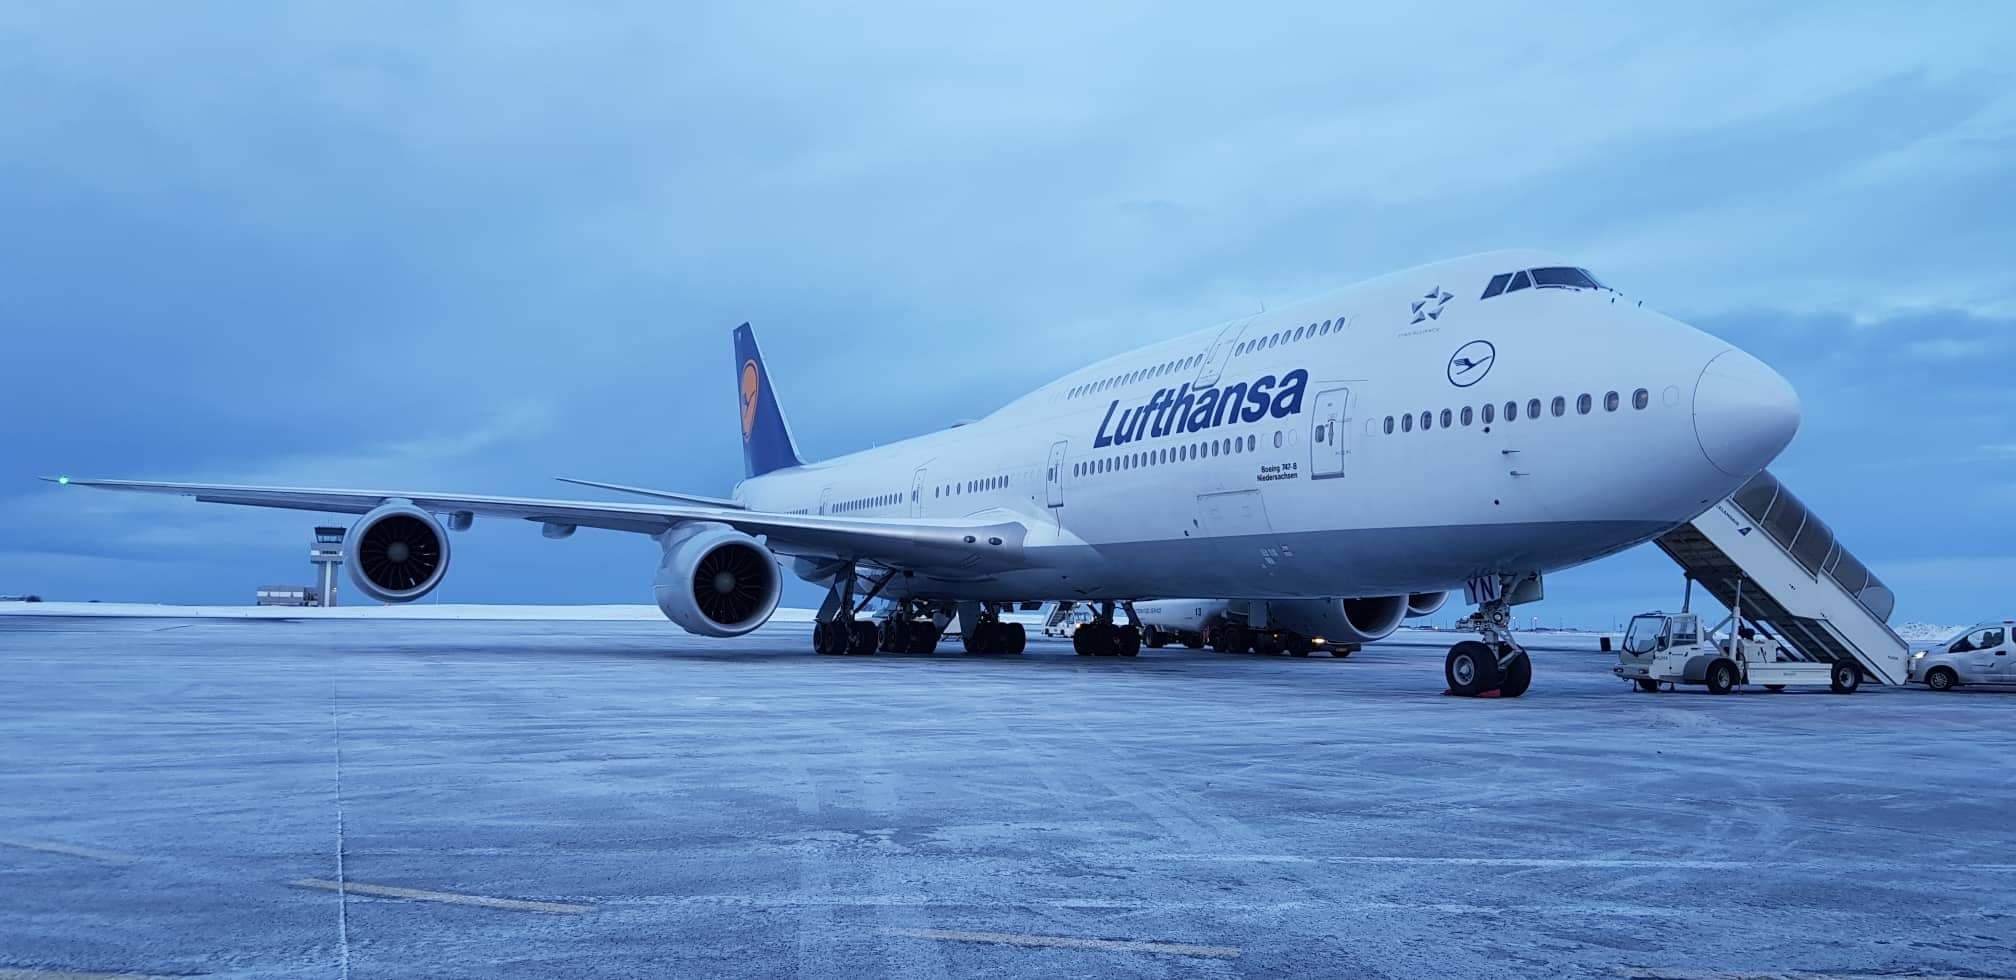 Boeing 747-8i reg. D-ABYN has diverted to Keflavik during Lufthansa flight DLH441 from Houston to Frankfurt // Source: Kamil Krzywdzinski